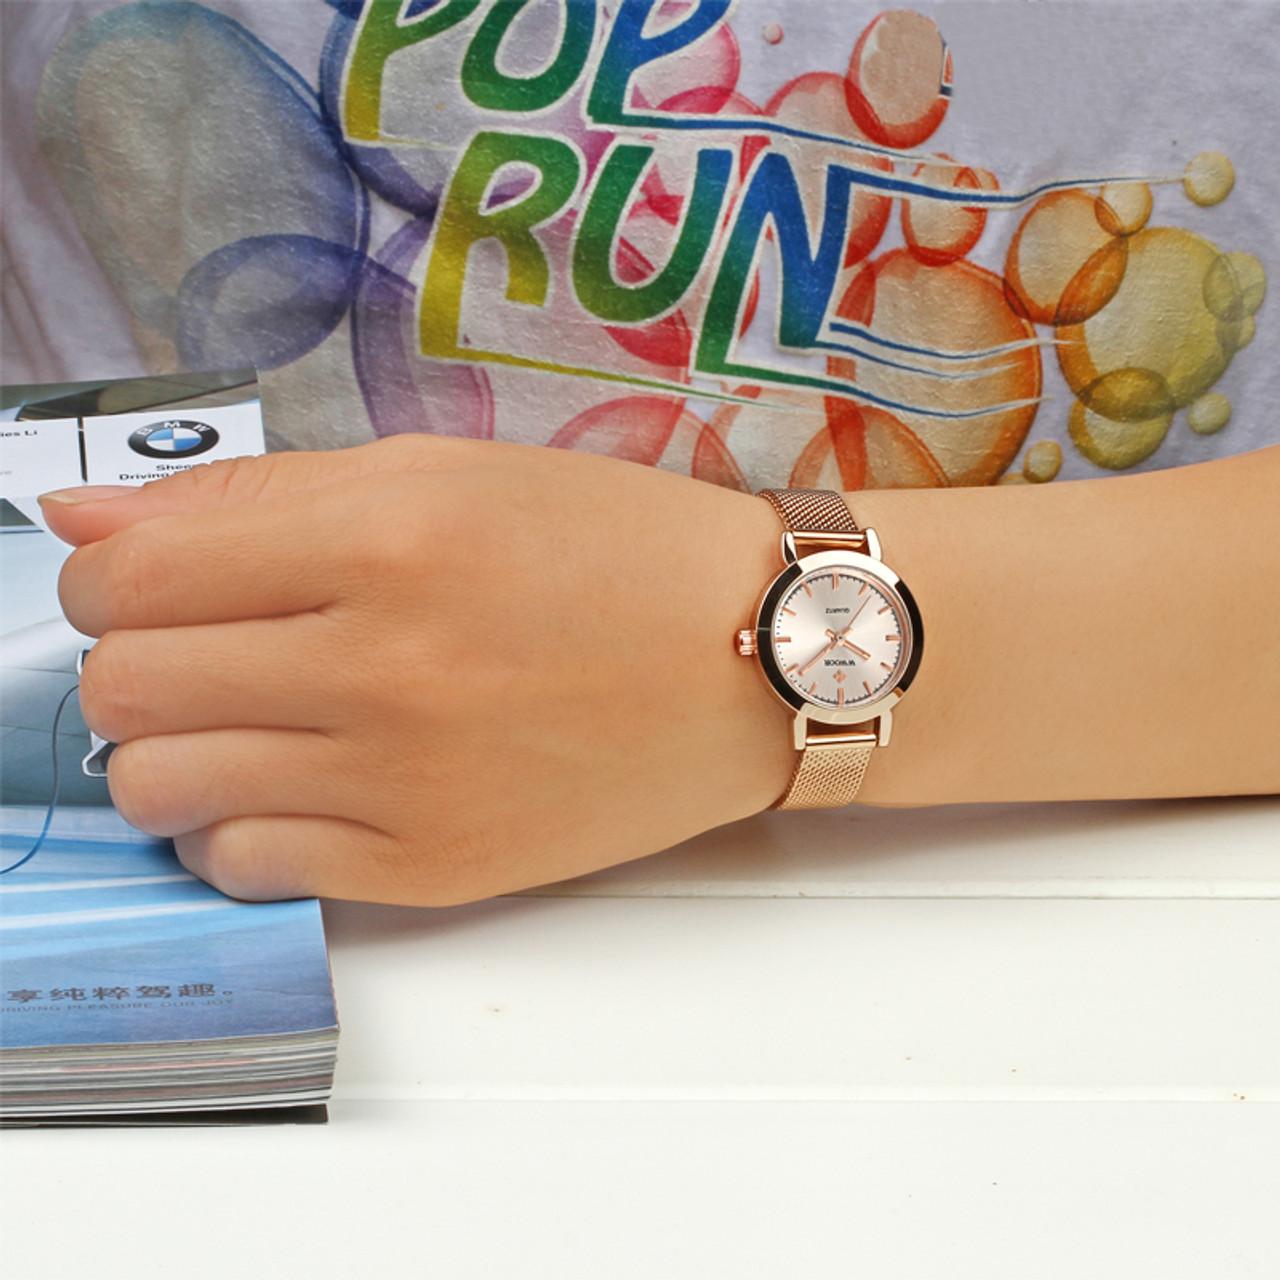 Good Women Dress Watches Luxury Brand Ladies Quartz Watch Stainless Steel Mesh Band Casual Gold Bracelet Wristwatch Reloj Mujer Women's Watches